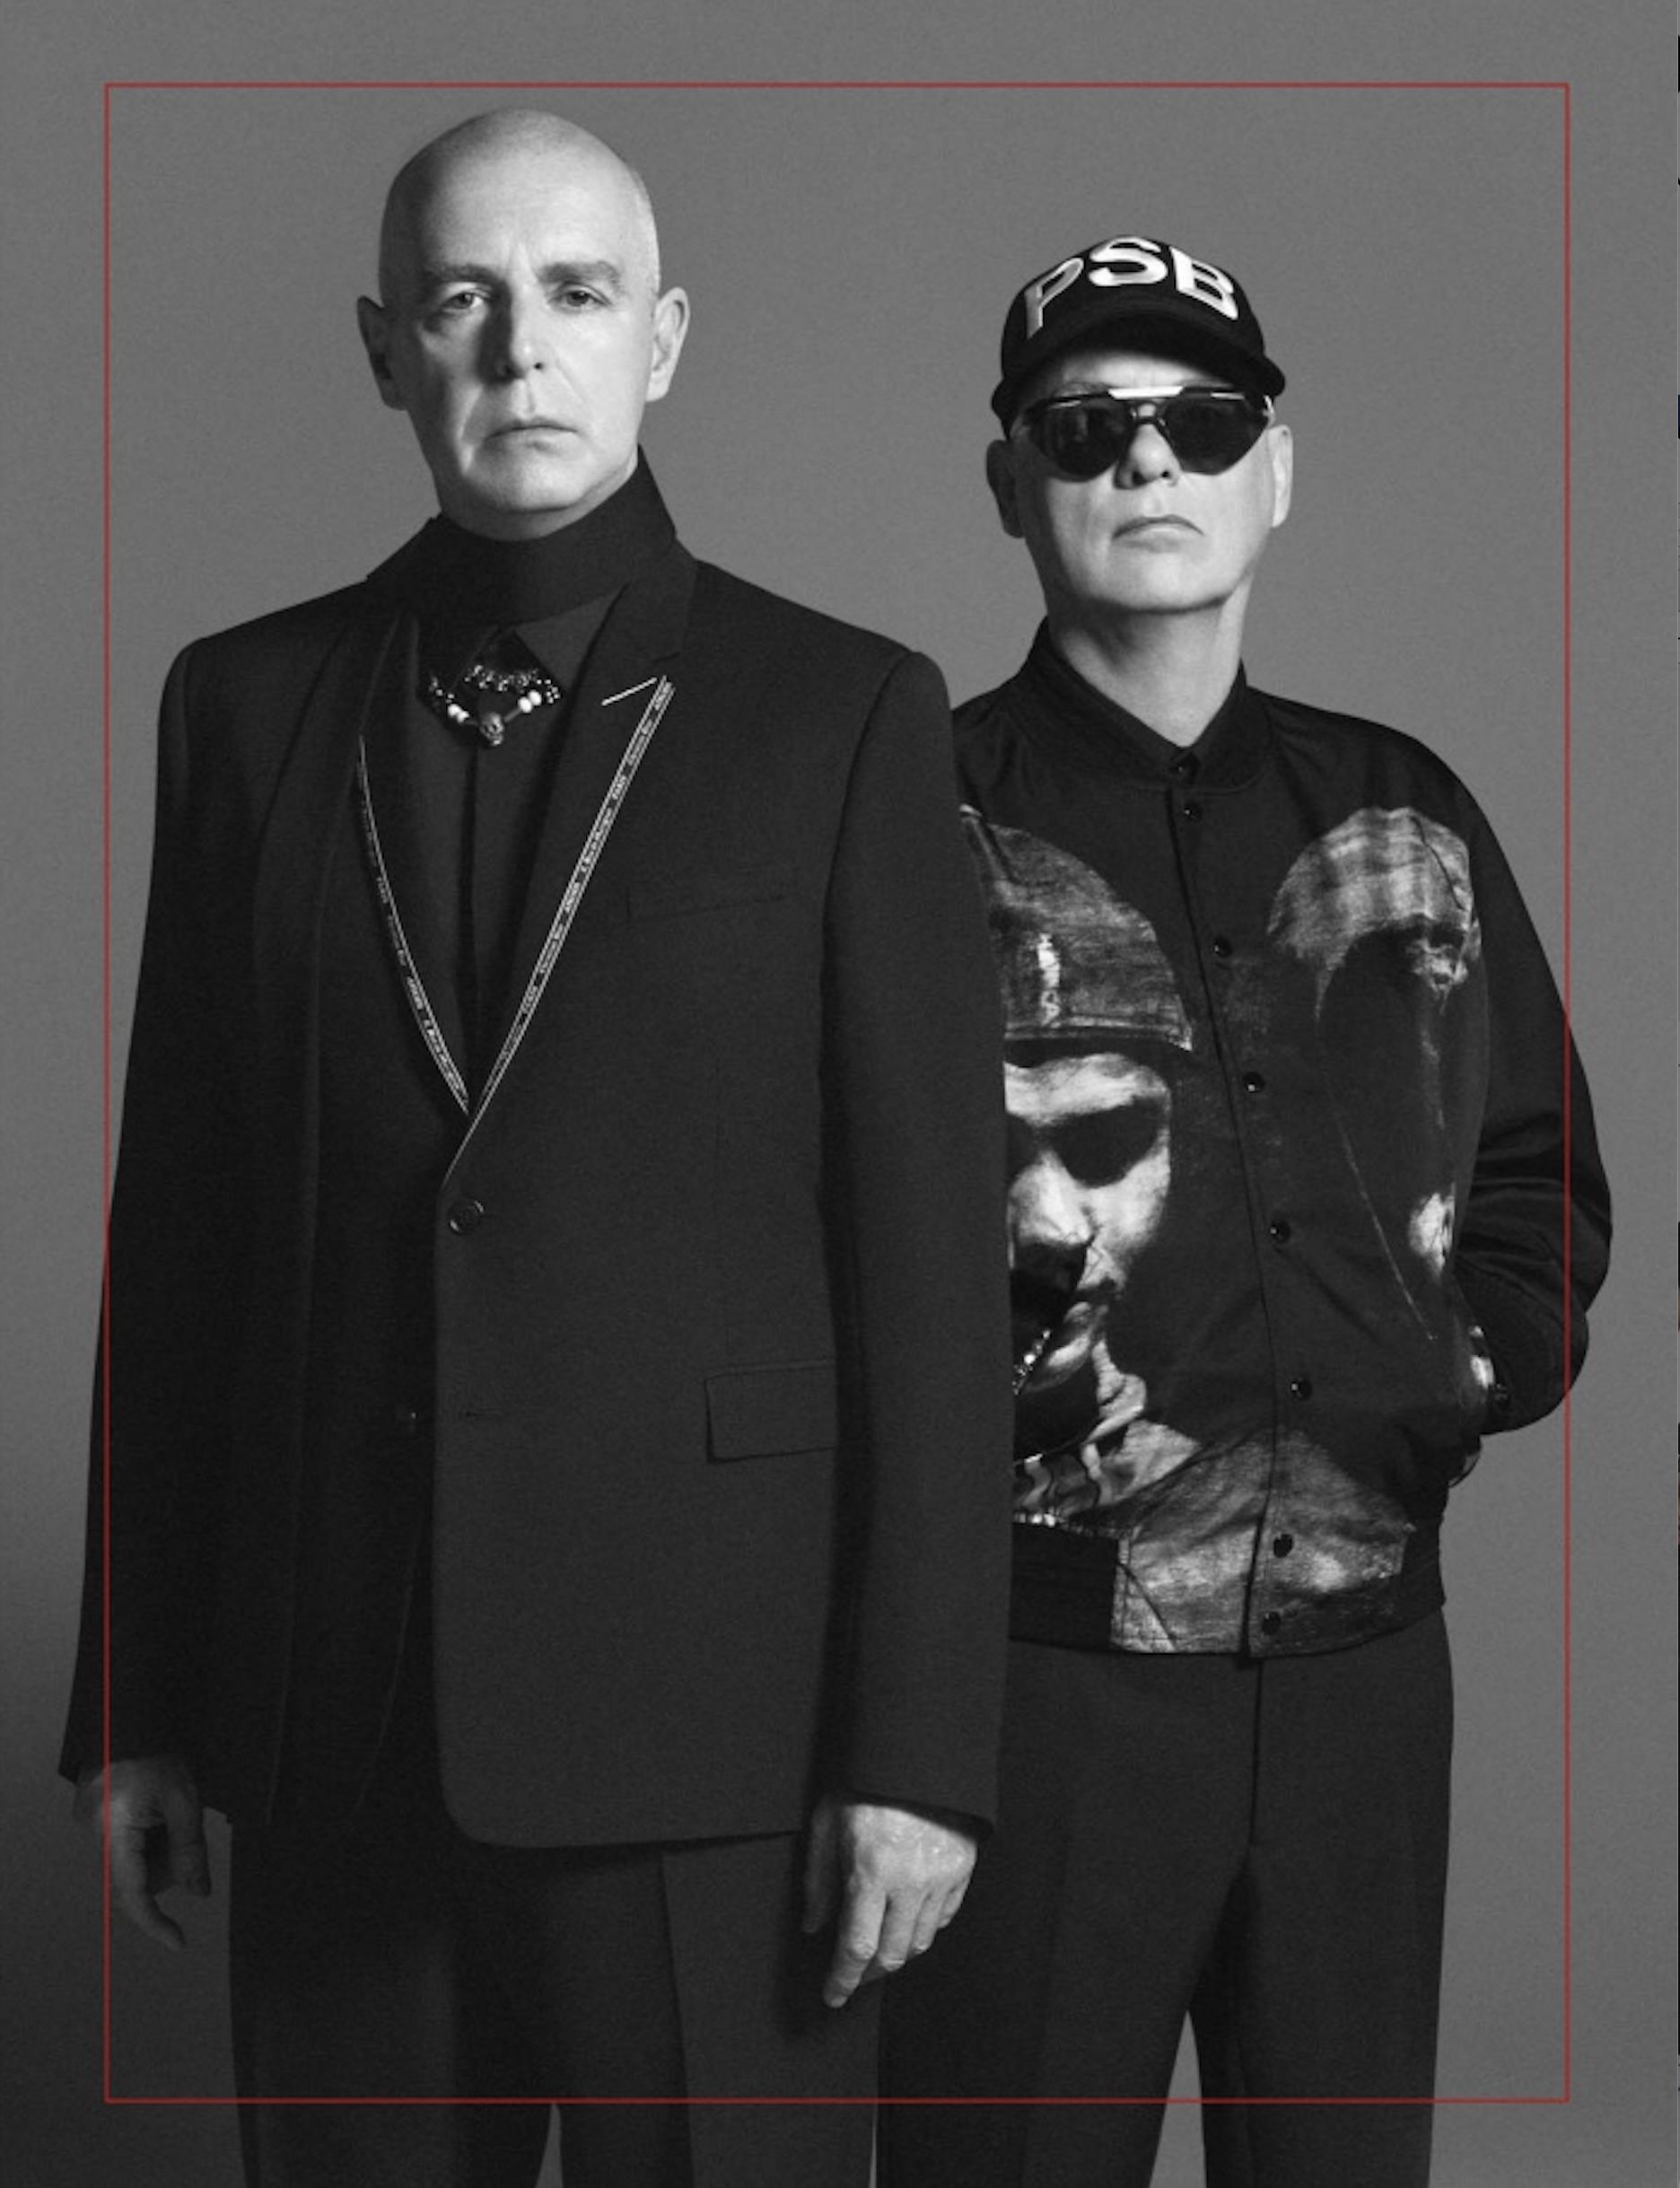 Pet Shop Boys for Dior Homme, 2018.